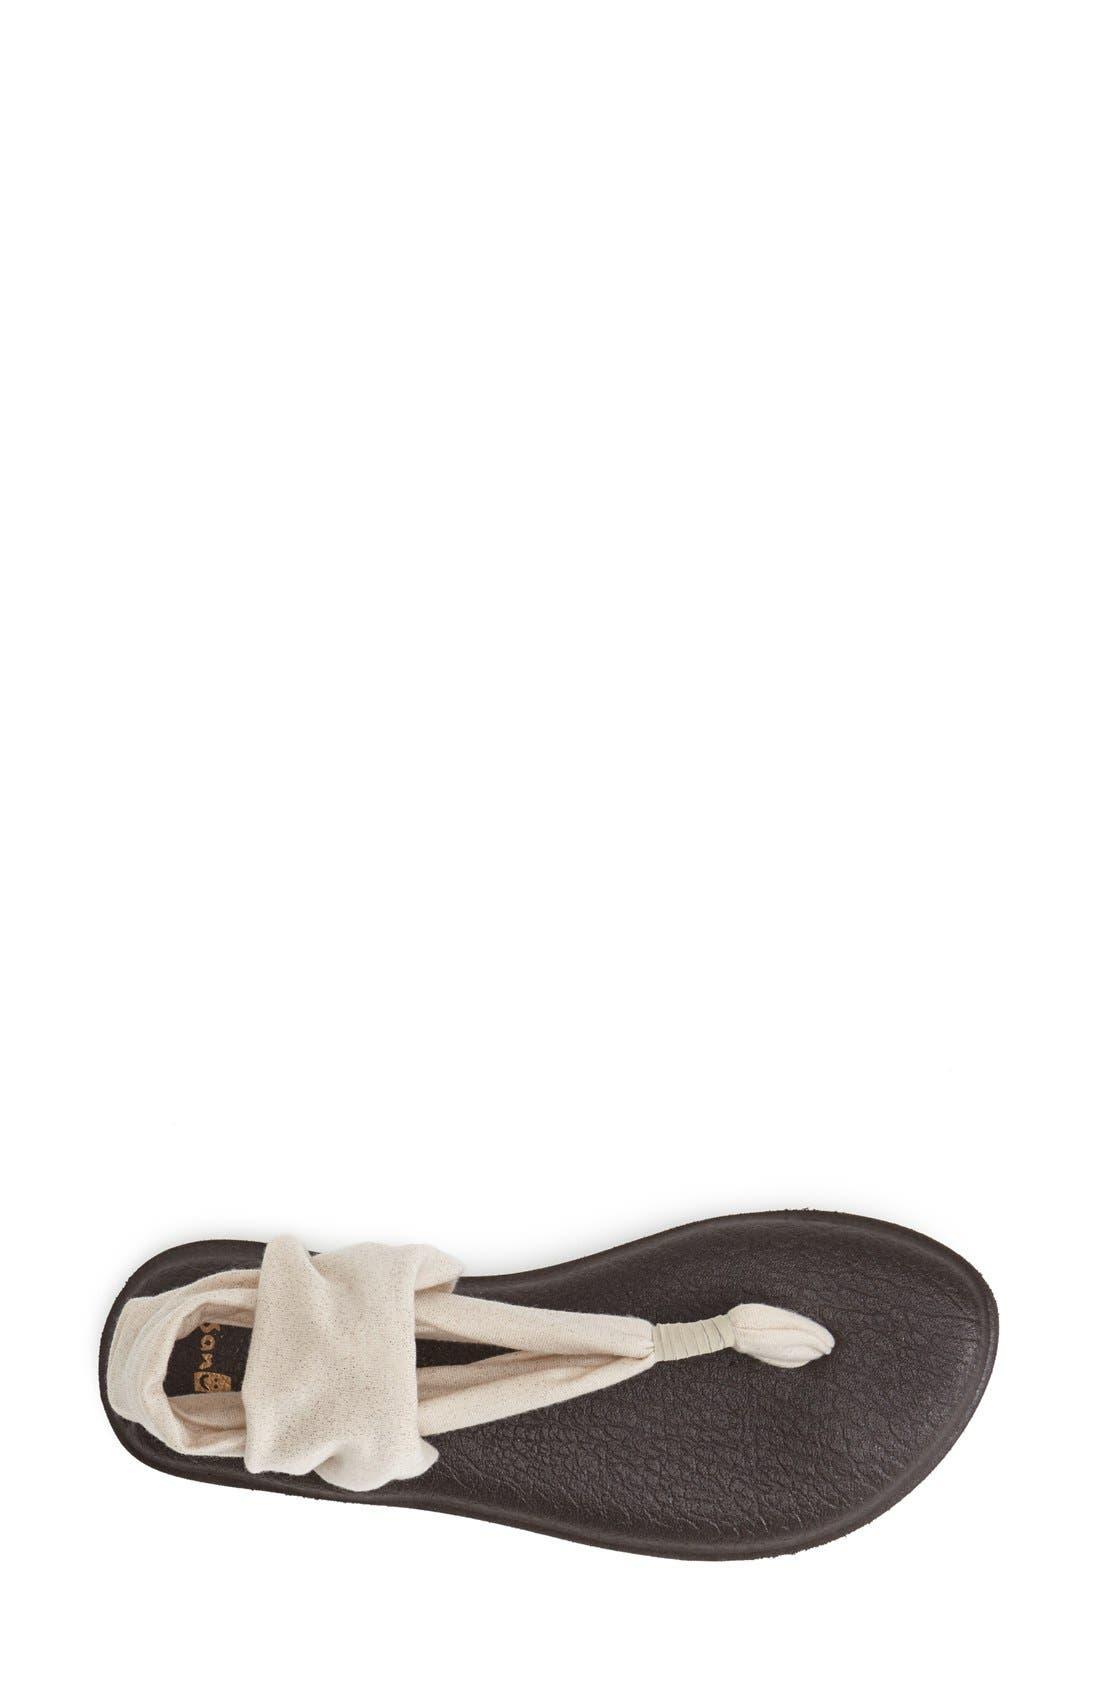 'Yoga Metallic Sling' Sandal,                             Alternate thumbnail 3, color,                             650